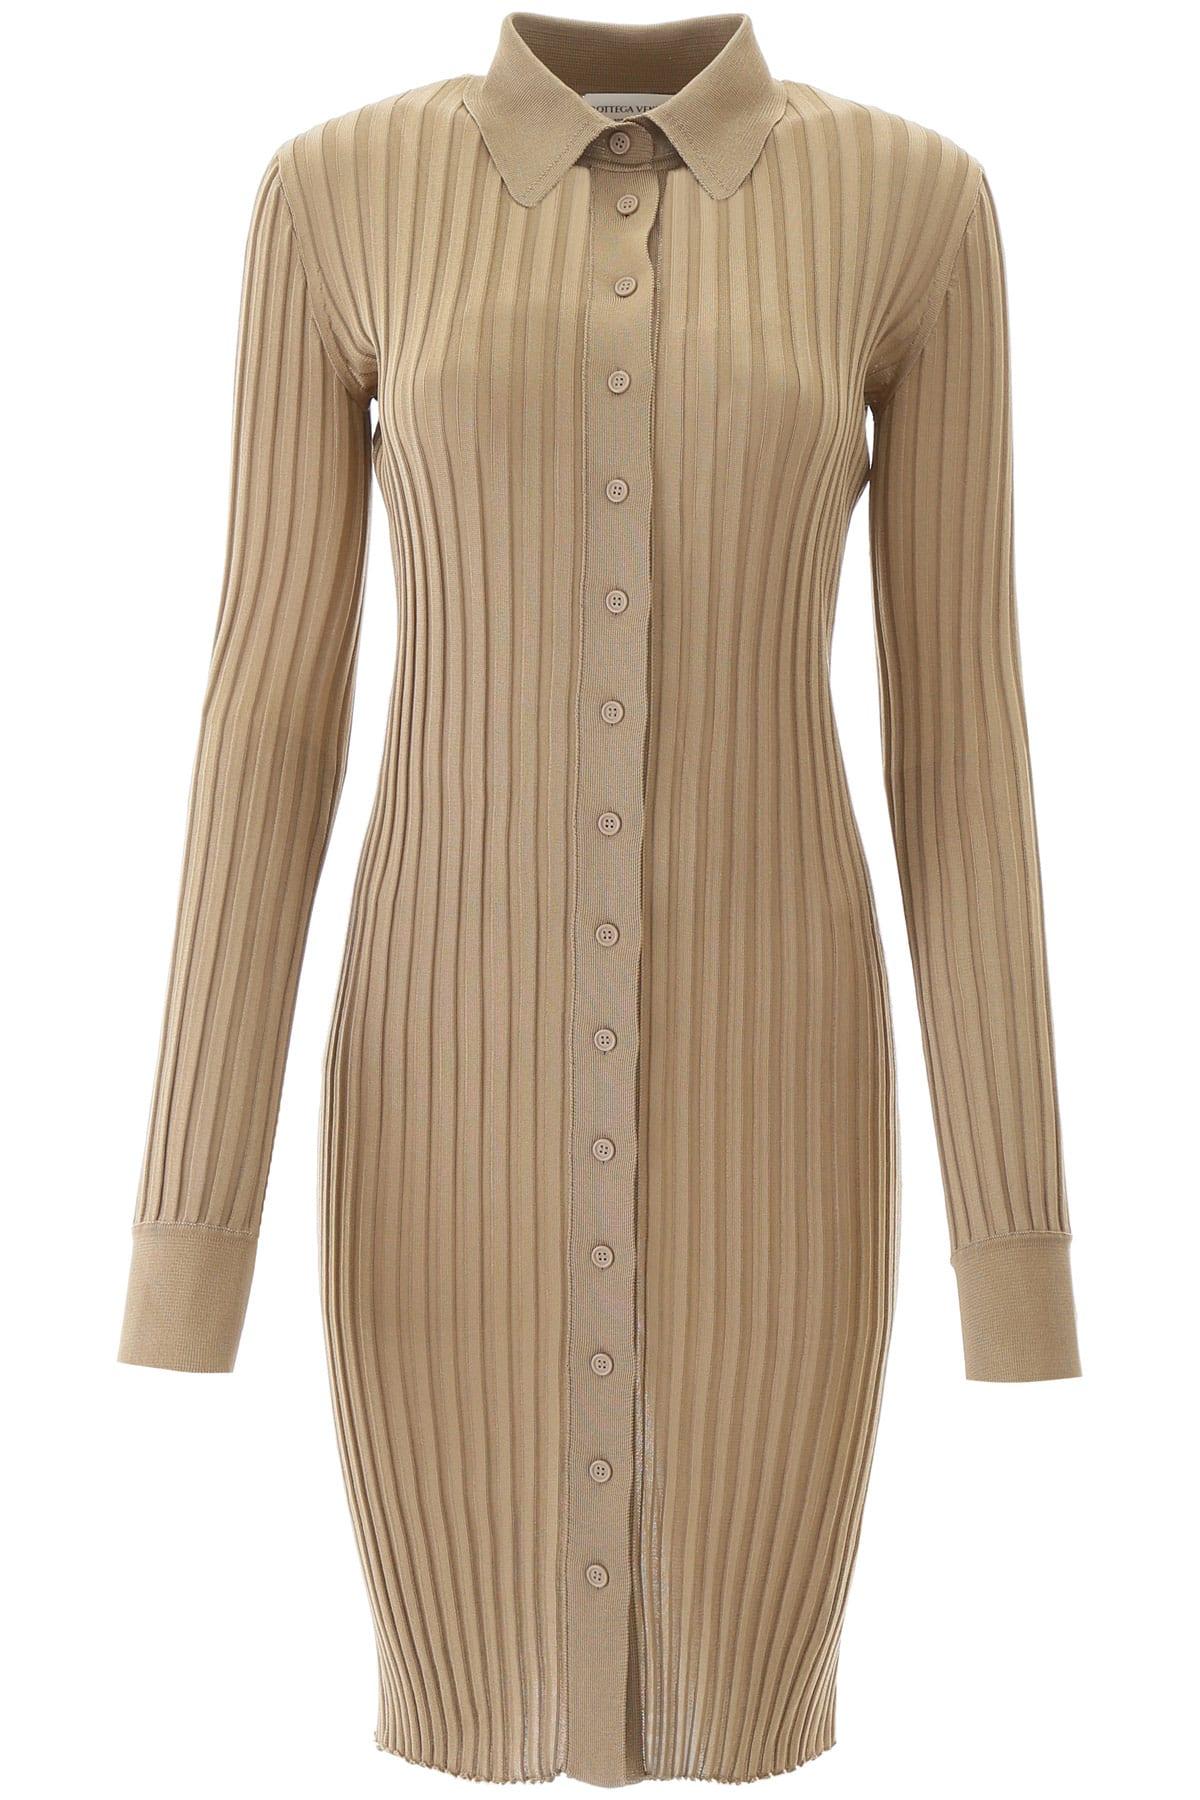 Buy Bottega Veneta Ribbed Silk Dress online, shop Bottega Veneta with free shipping